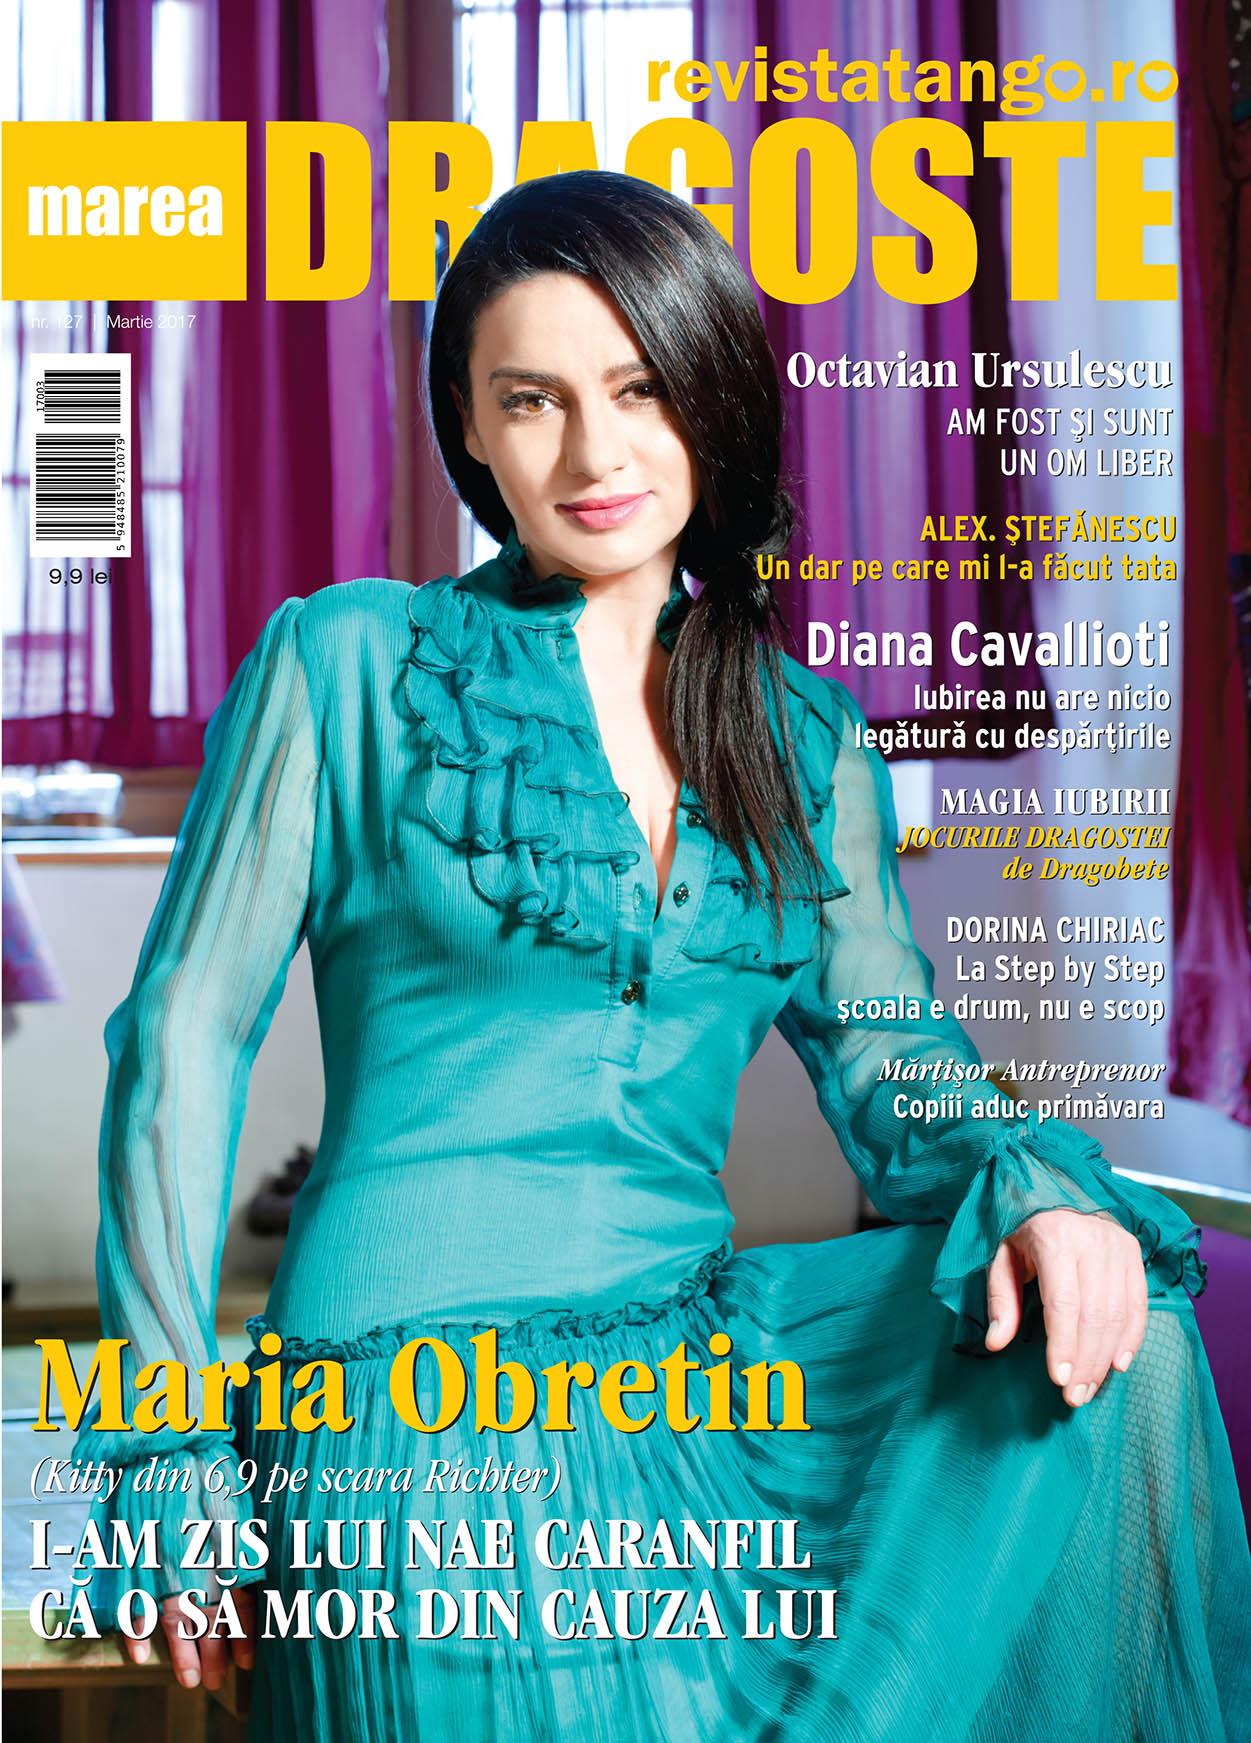 Maria Obretin pe coperta Marea Dragoste-revistatango.ro, nr. 127, martie 2017